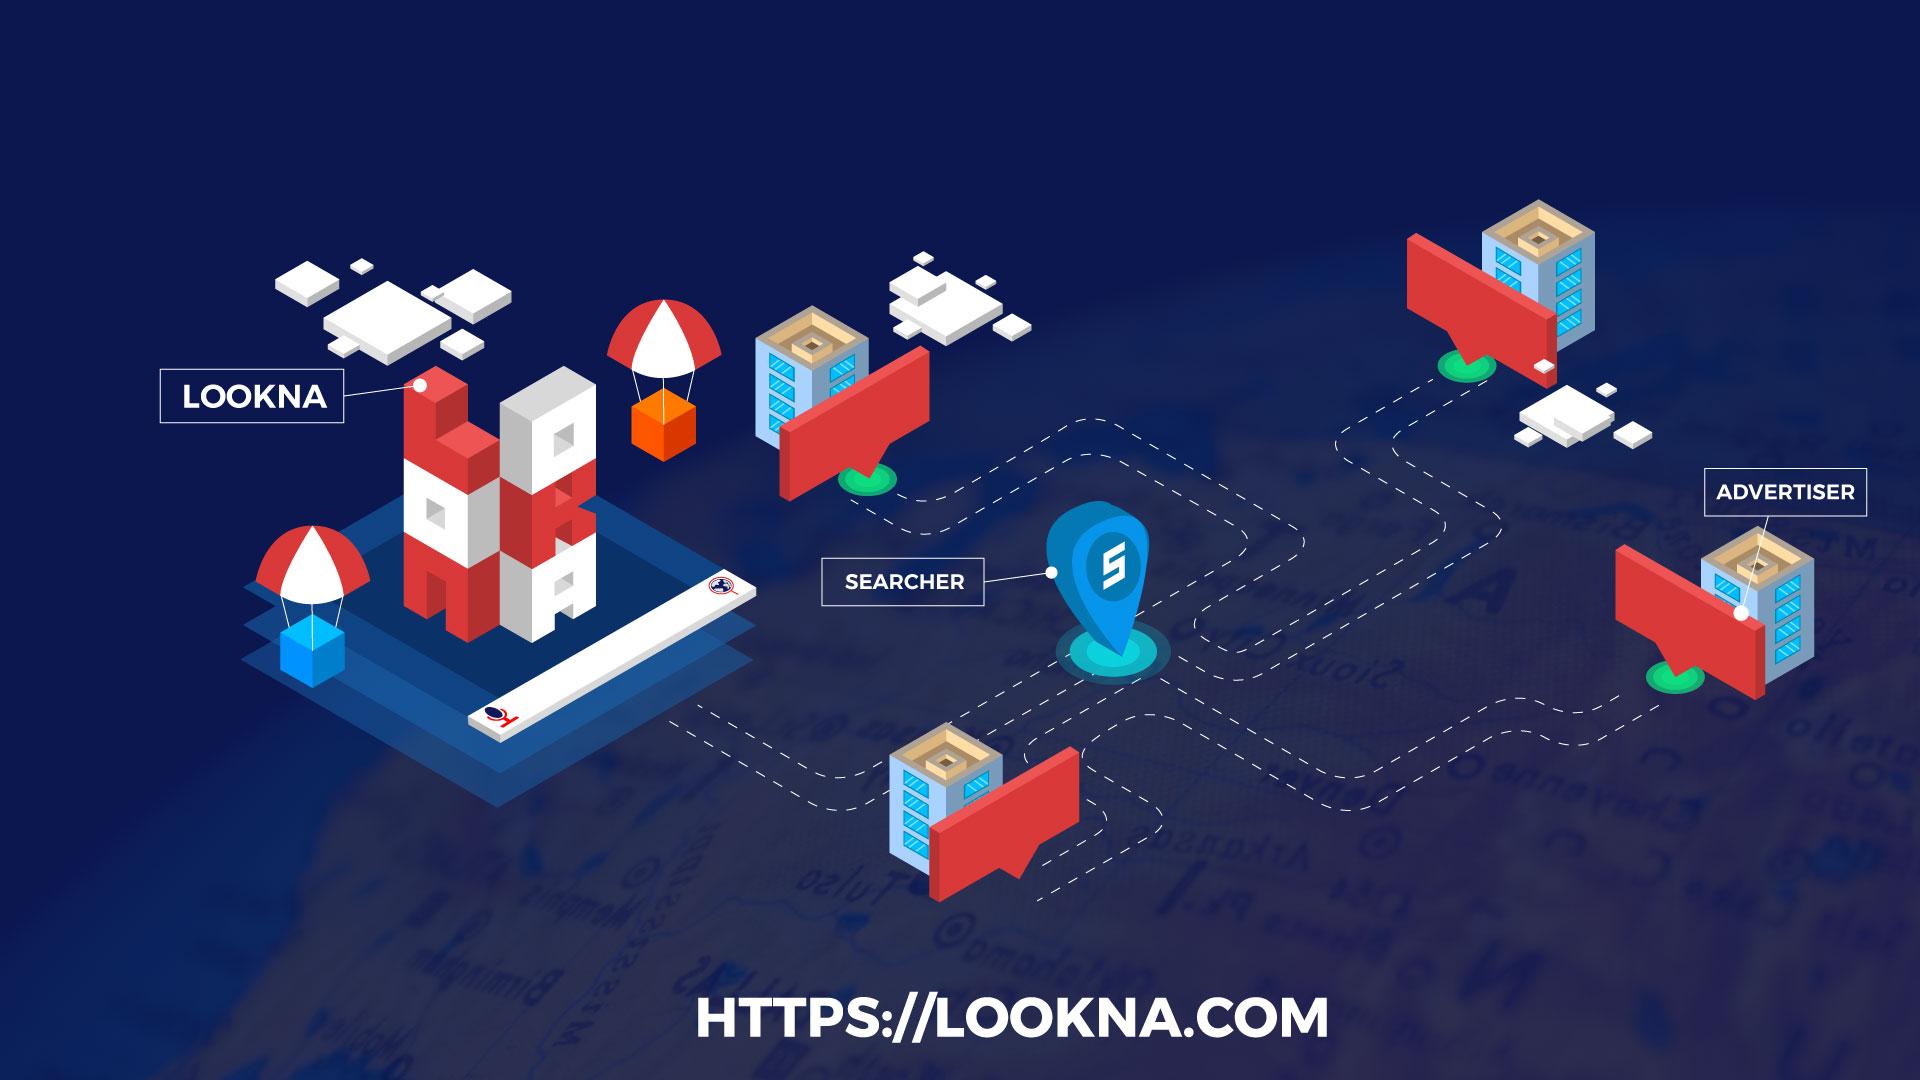 lookna-helping-legit-businesses-increase-revenue-potential